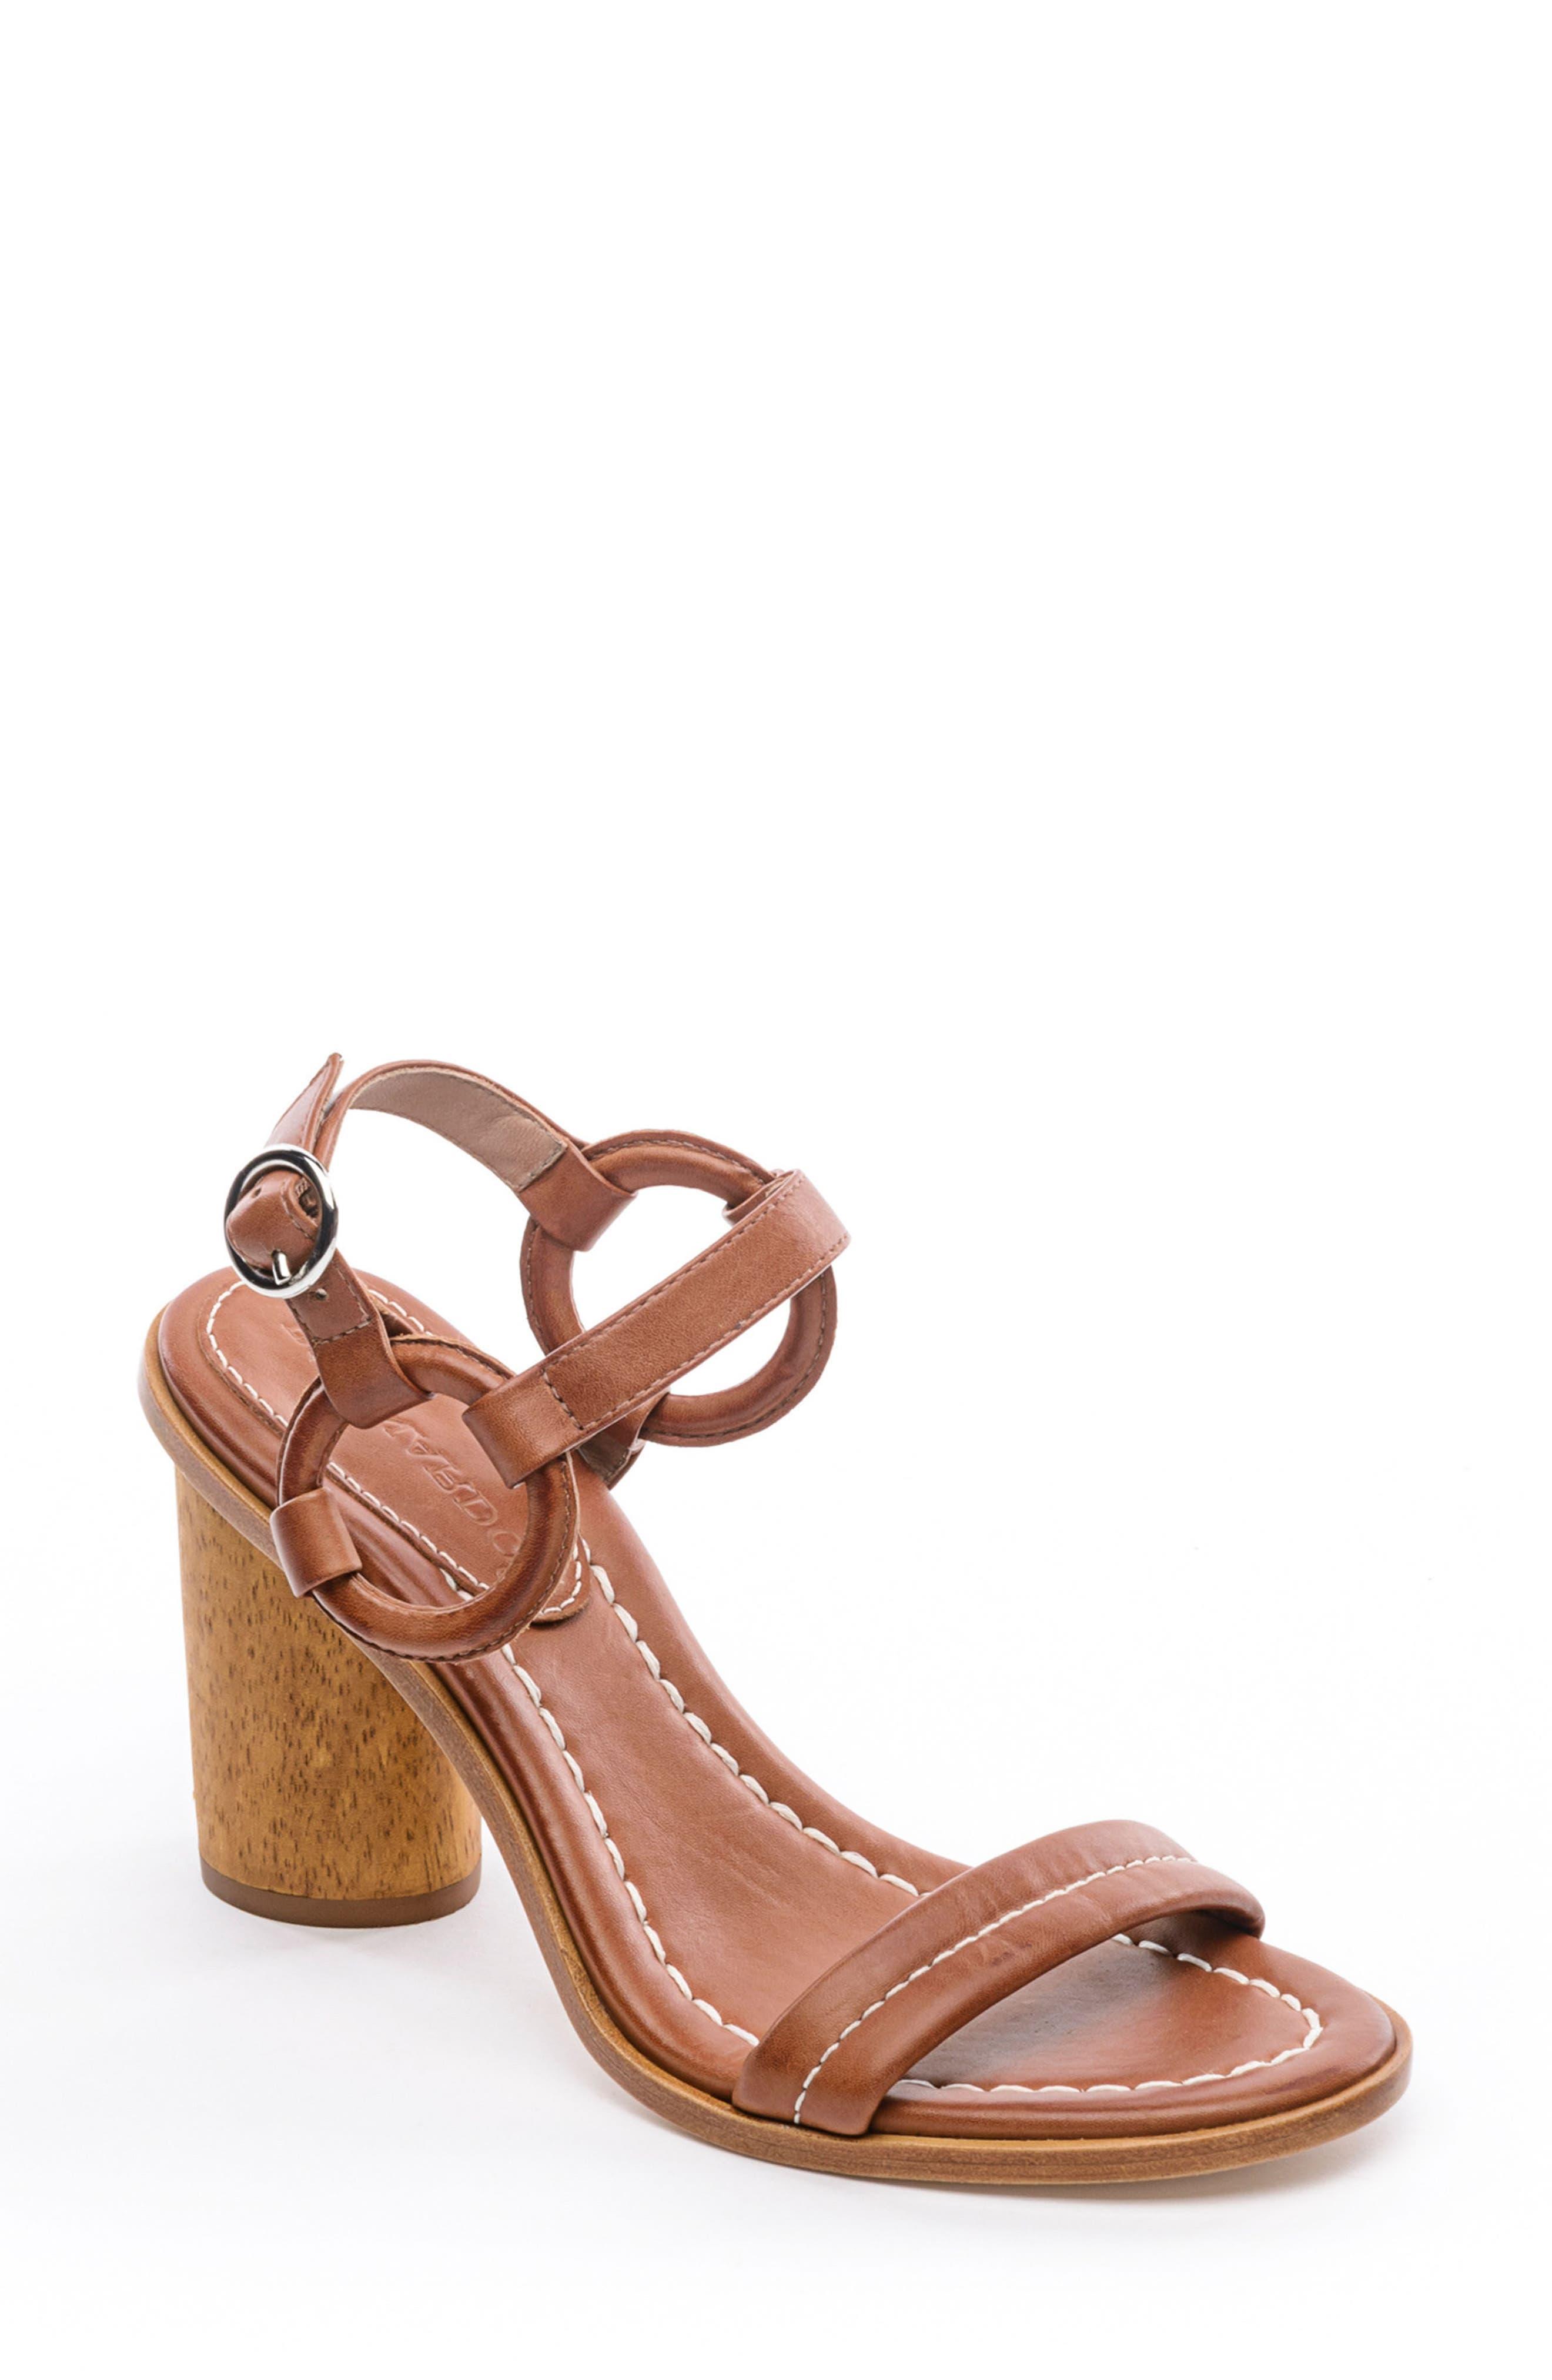 Bernardo Harlow Ankle Strap Sandal,                             Main thumbnail 1, color,                             Luggage Leather